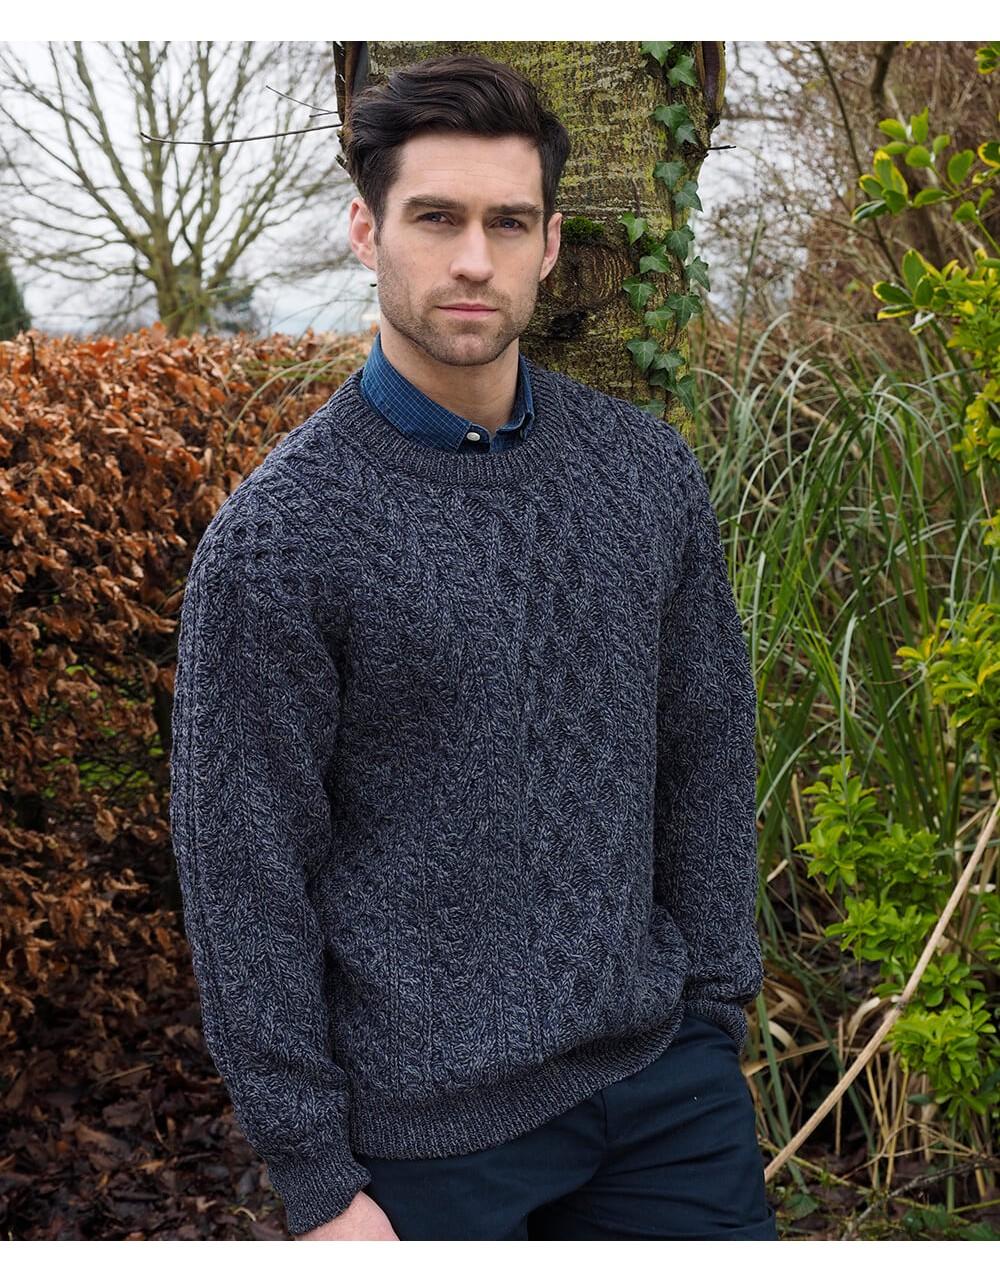 Heavy Crew Neck Aran Sweater|Aran Sweaters Men|Irish Handcrafts 1